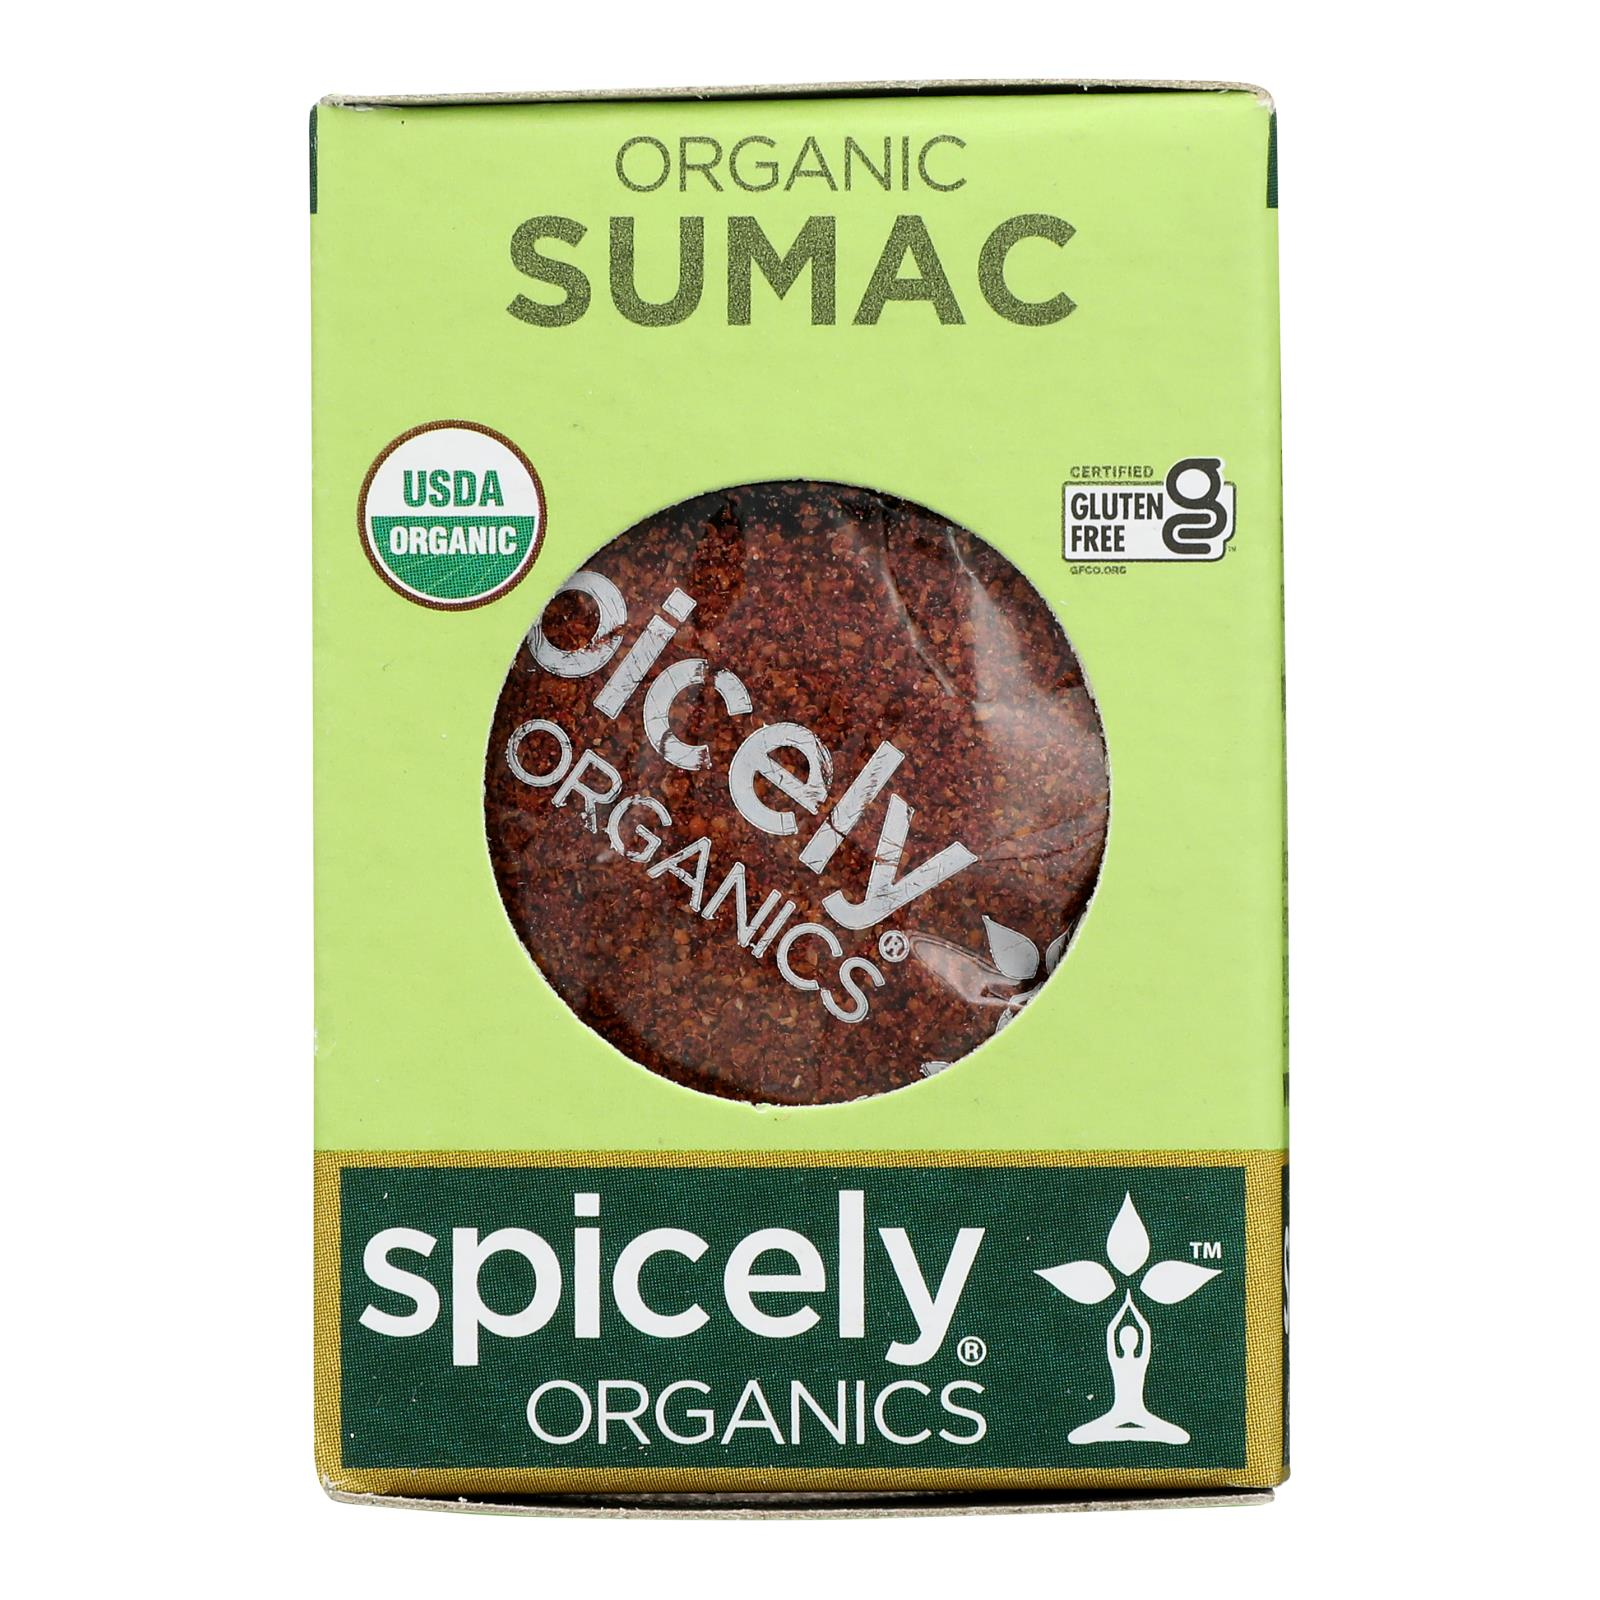 Spicely Organics - Organic Sumac - Case of 6 - 0.45 oz.